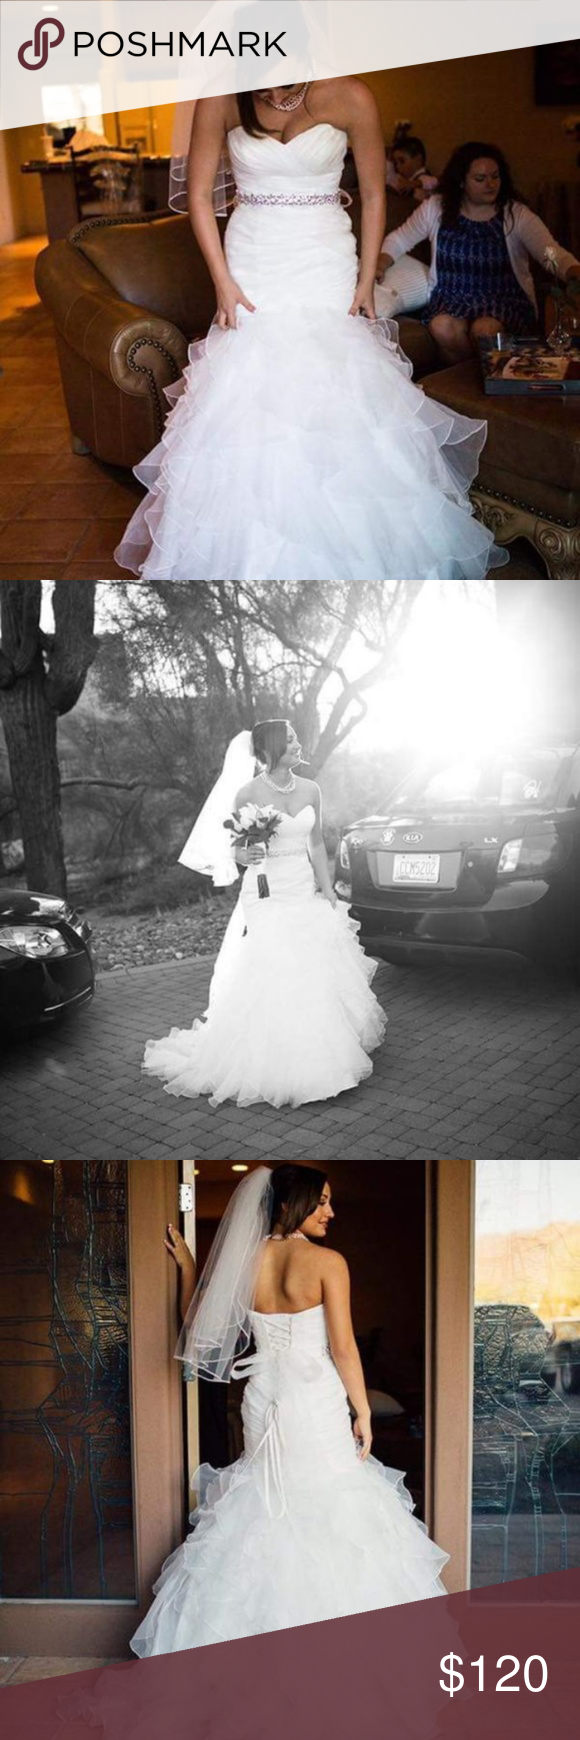 Corset for under wedding dress  Size  wedding dress  My Posh Picks  Pinterest  Wedding dresses